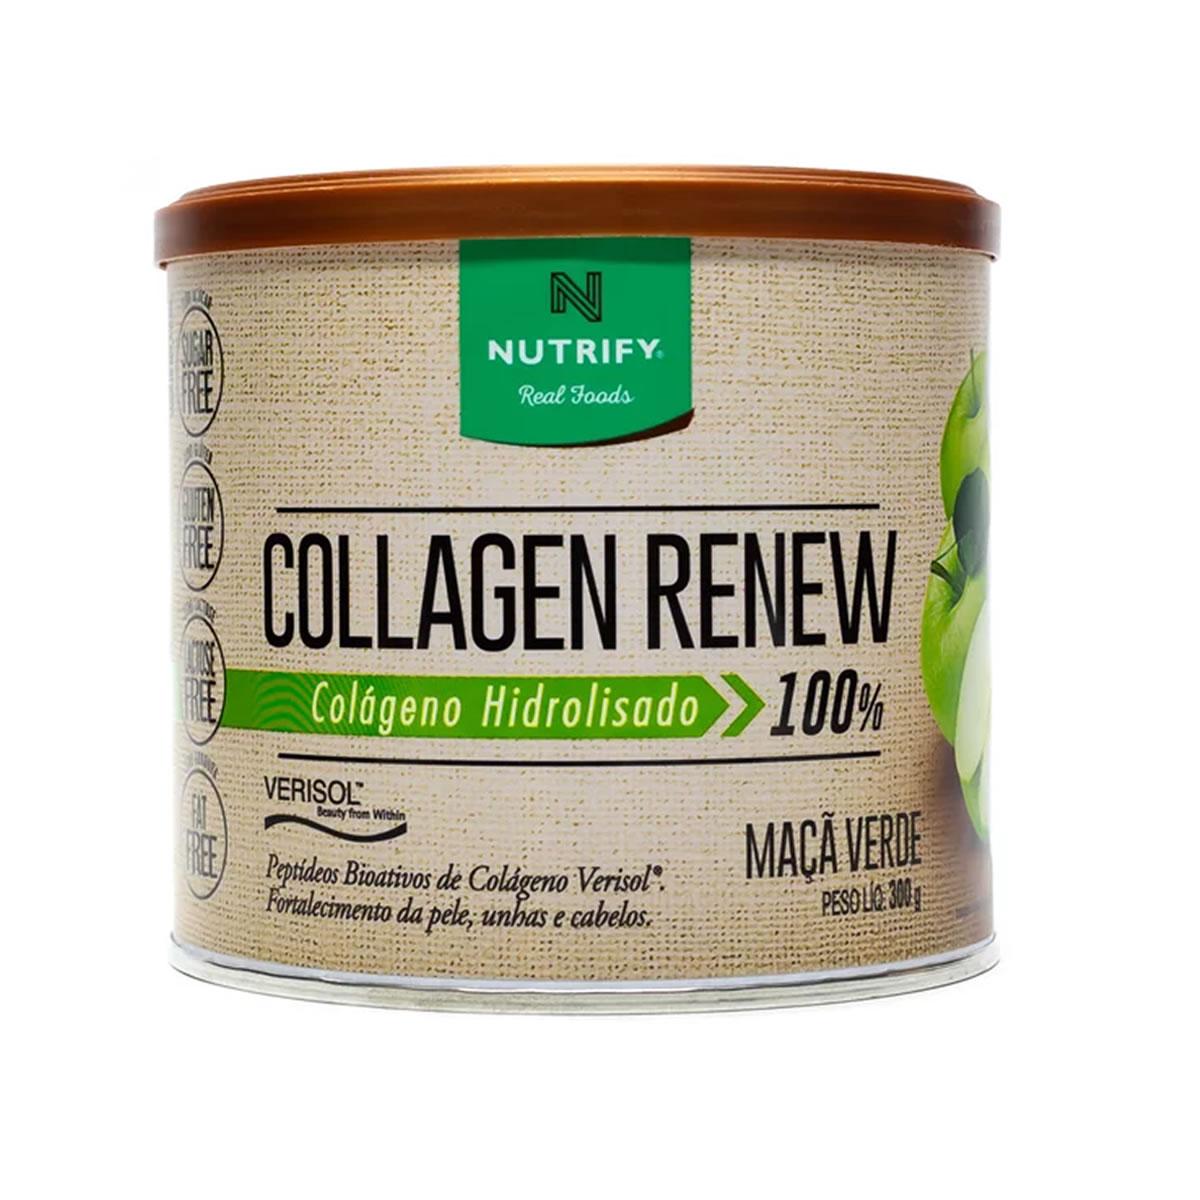 Colágeno Collagen Renew sabor Maça Verde 300g - Nutrify